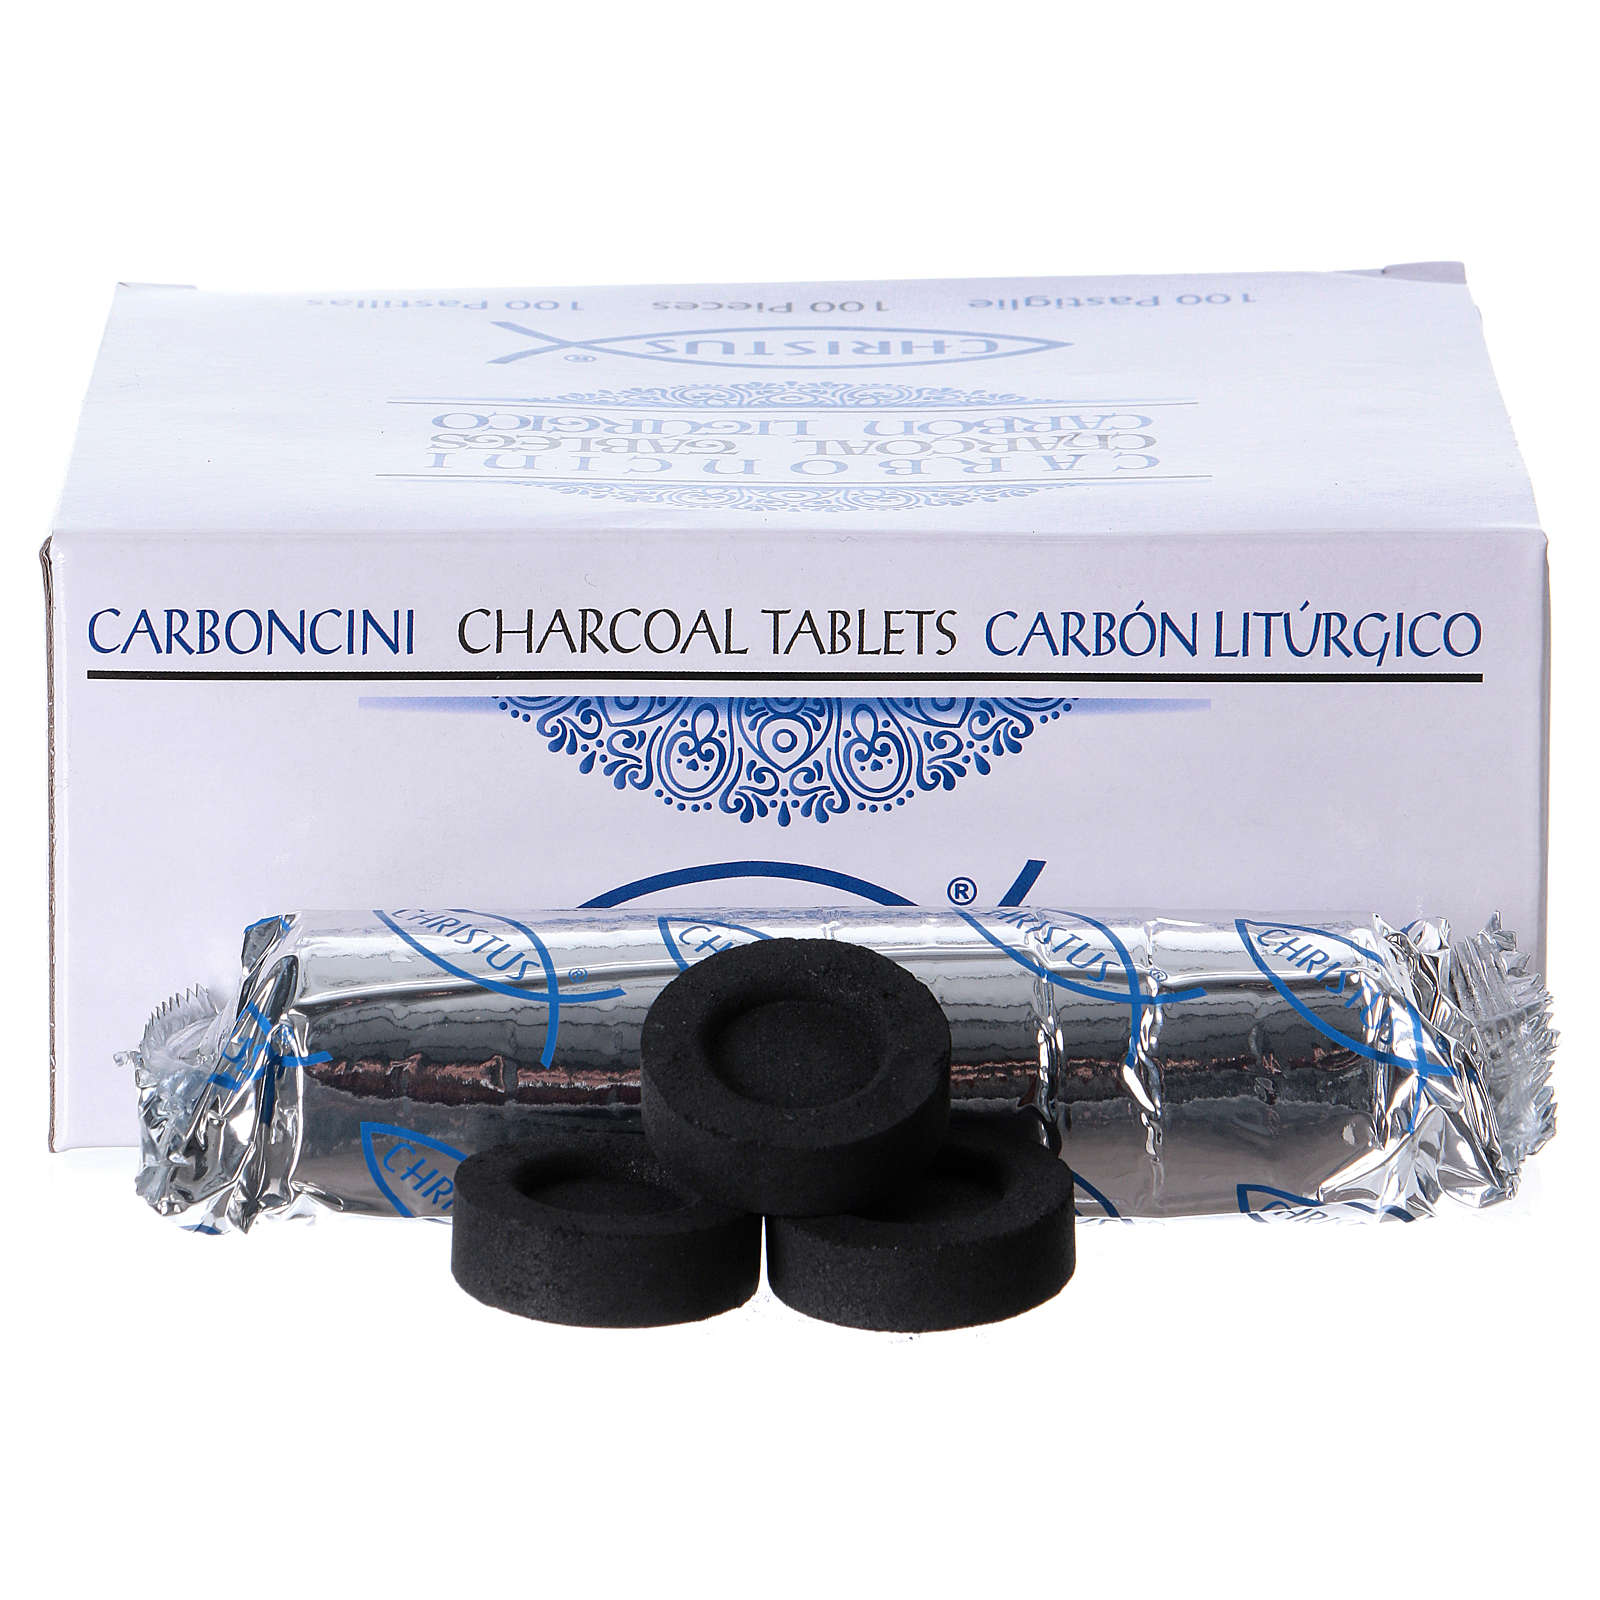 Incense charcoals 4 cm 100 tablets 3